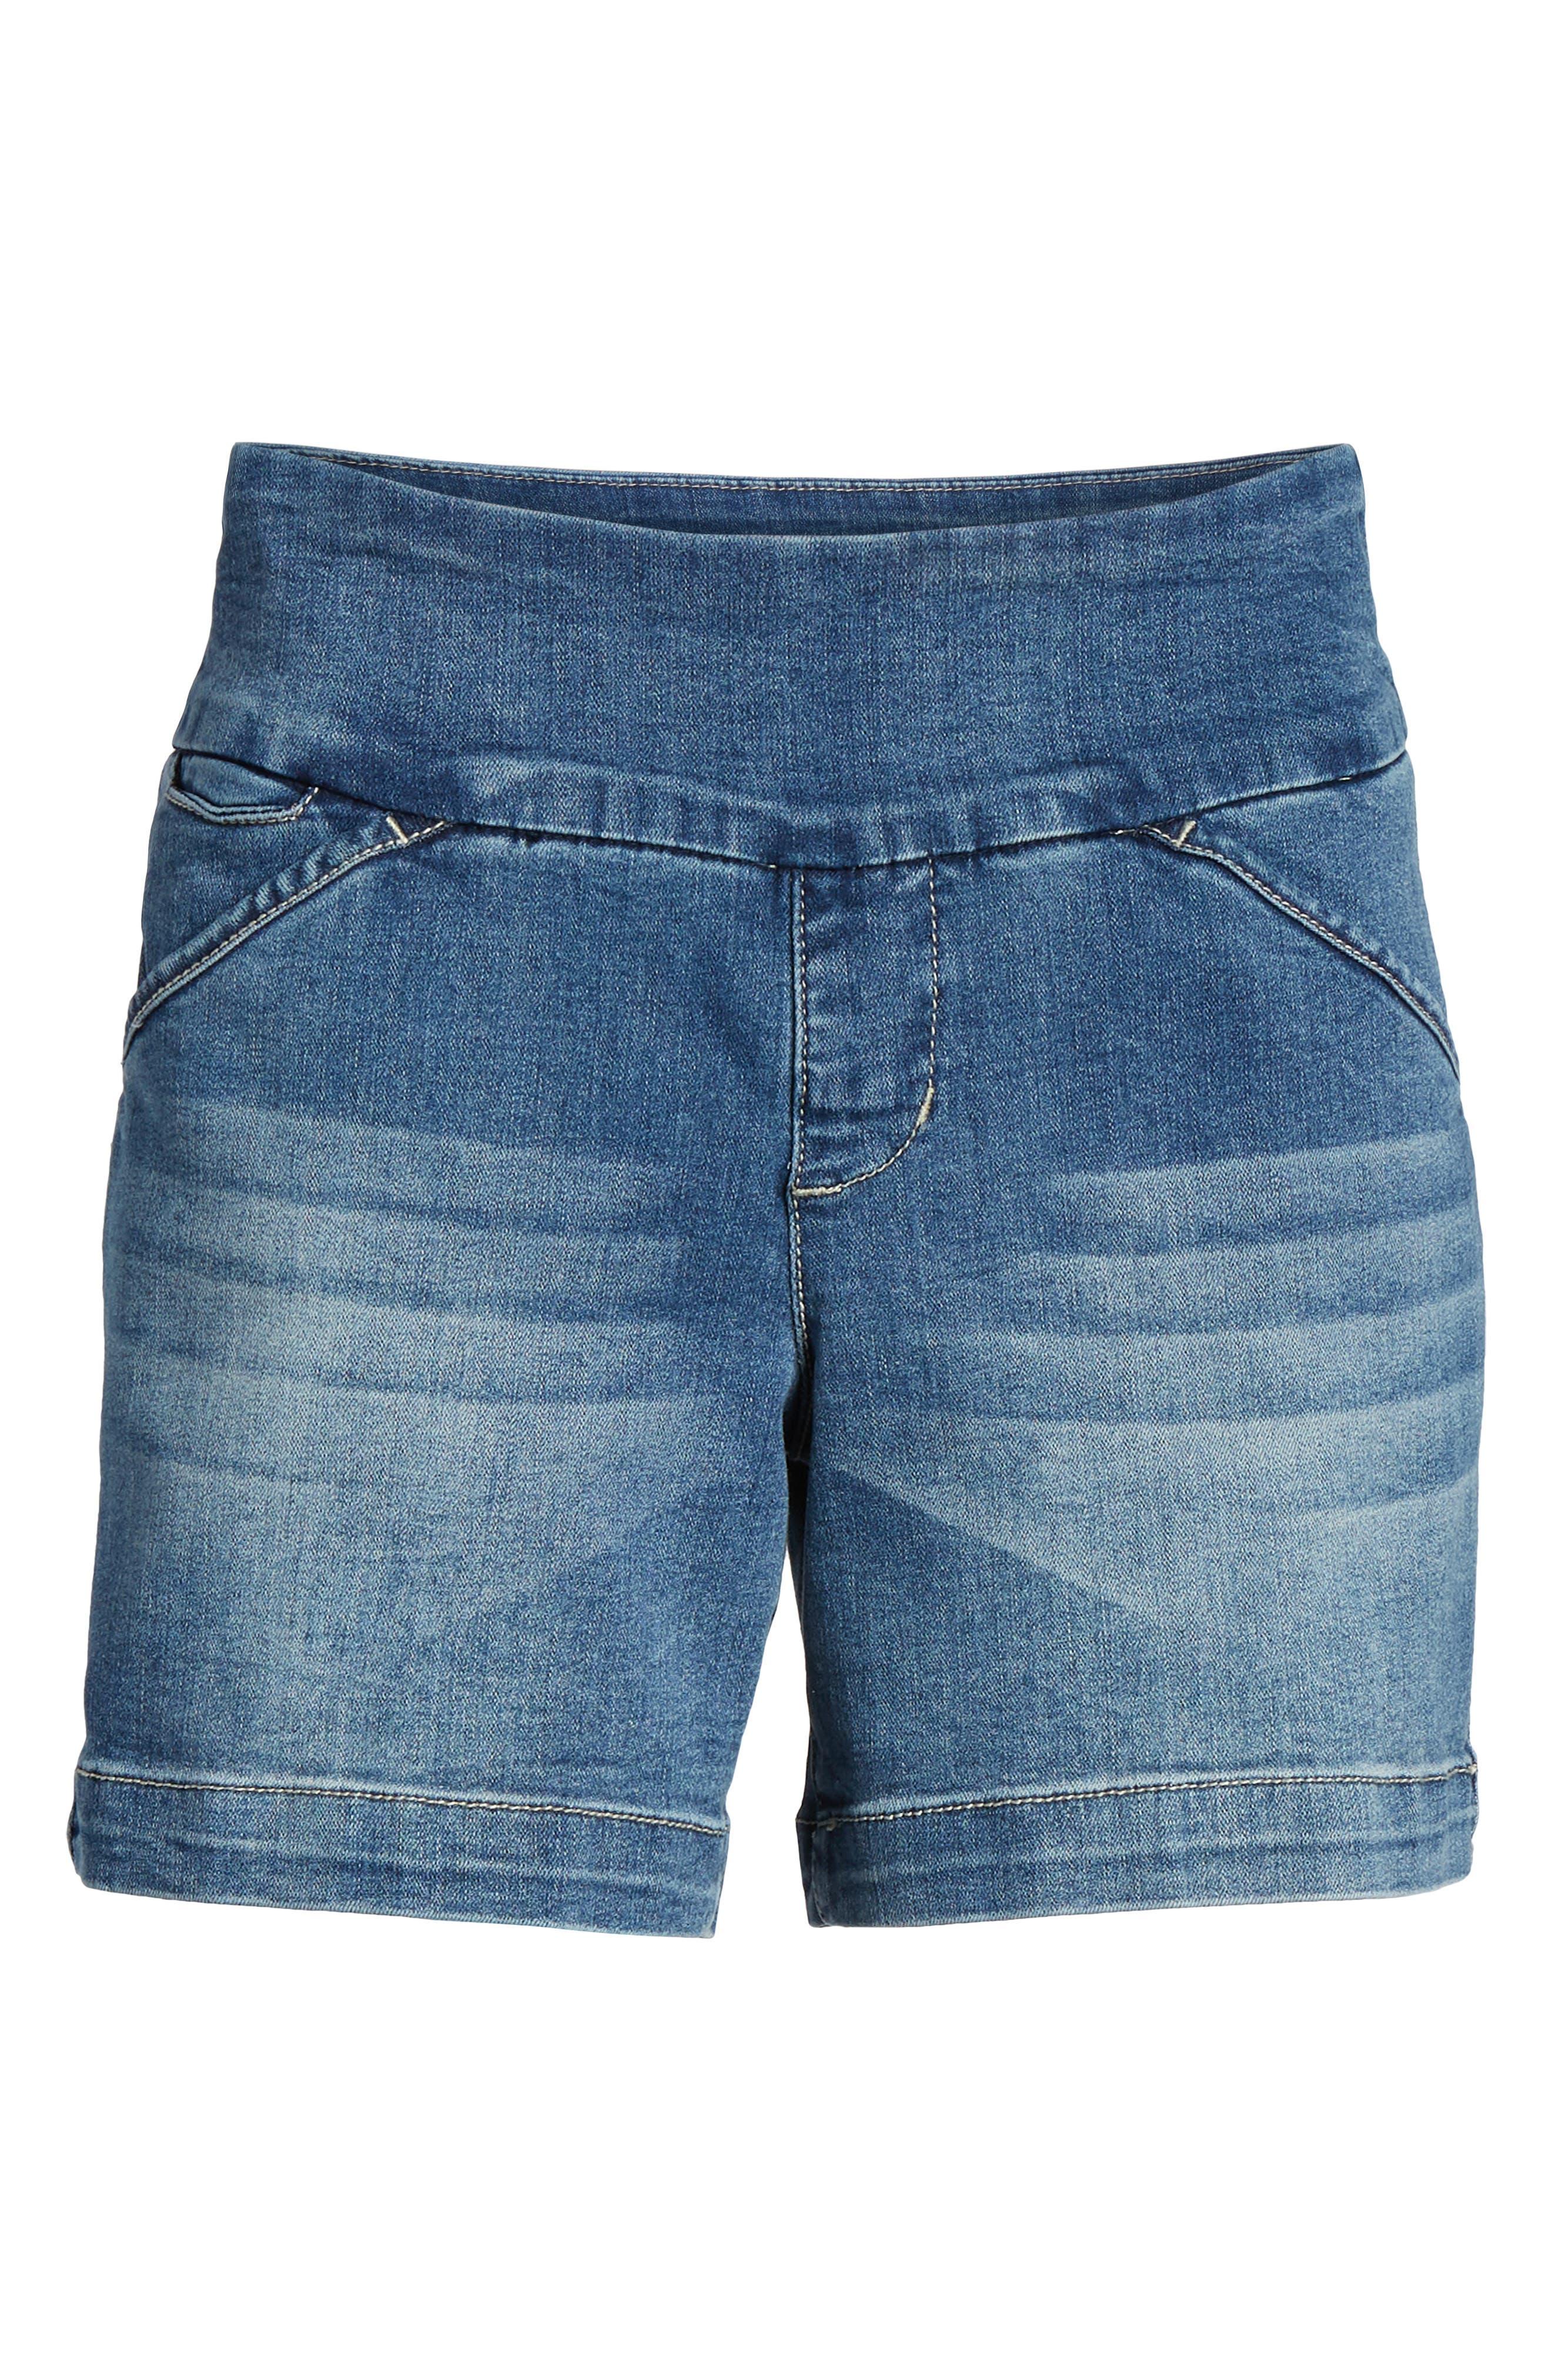 Ainsley 5 Denim Shorts,                             Alternate thumbnail 7, color,                             420